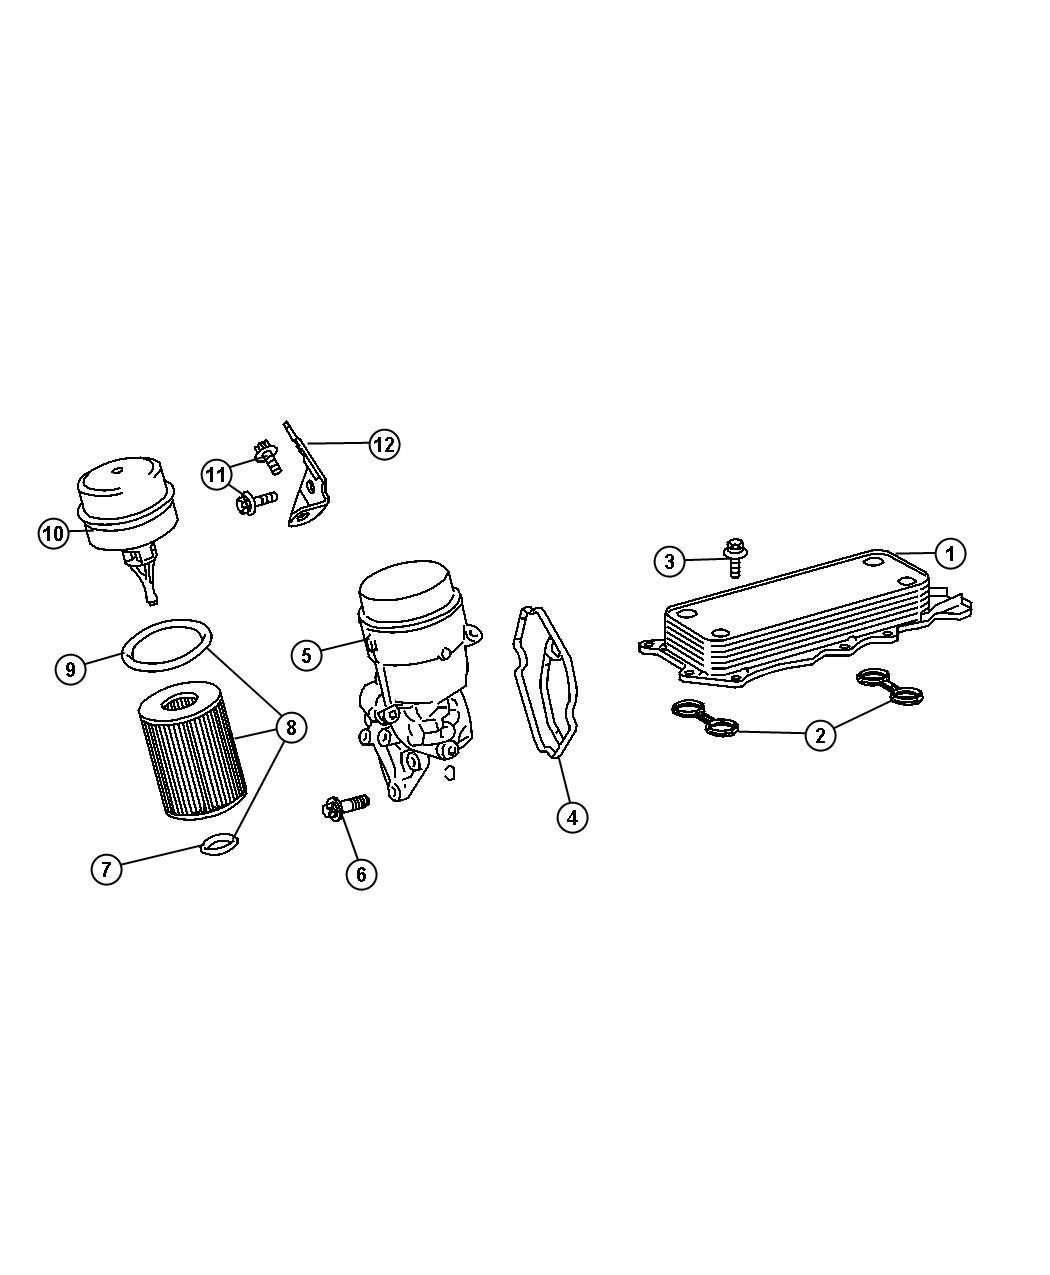 engine oil filter adapter cooler hoses tubes for